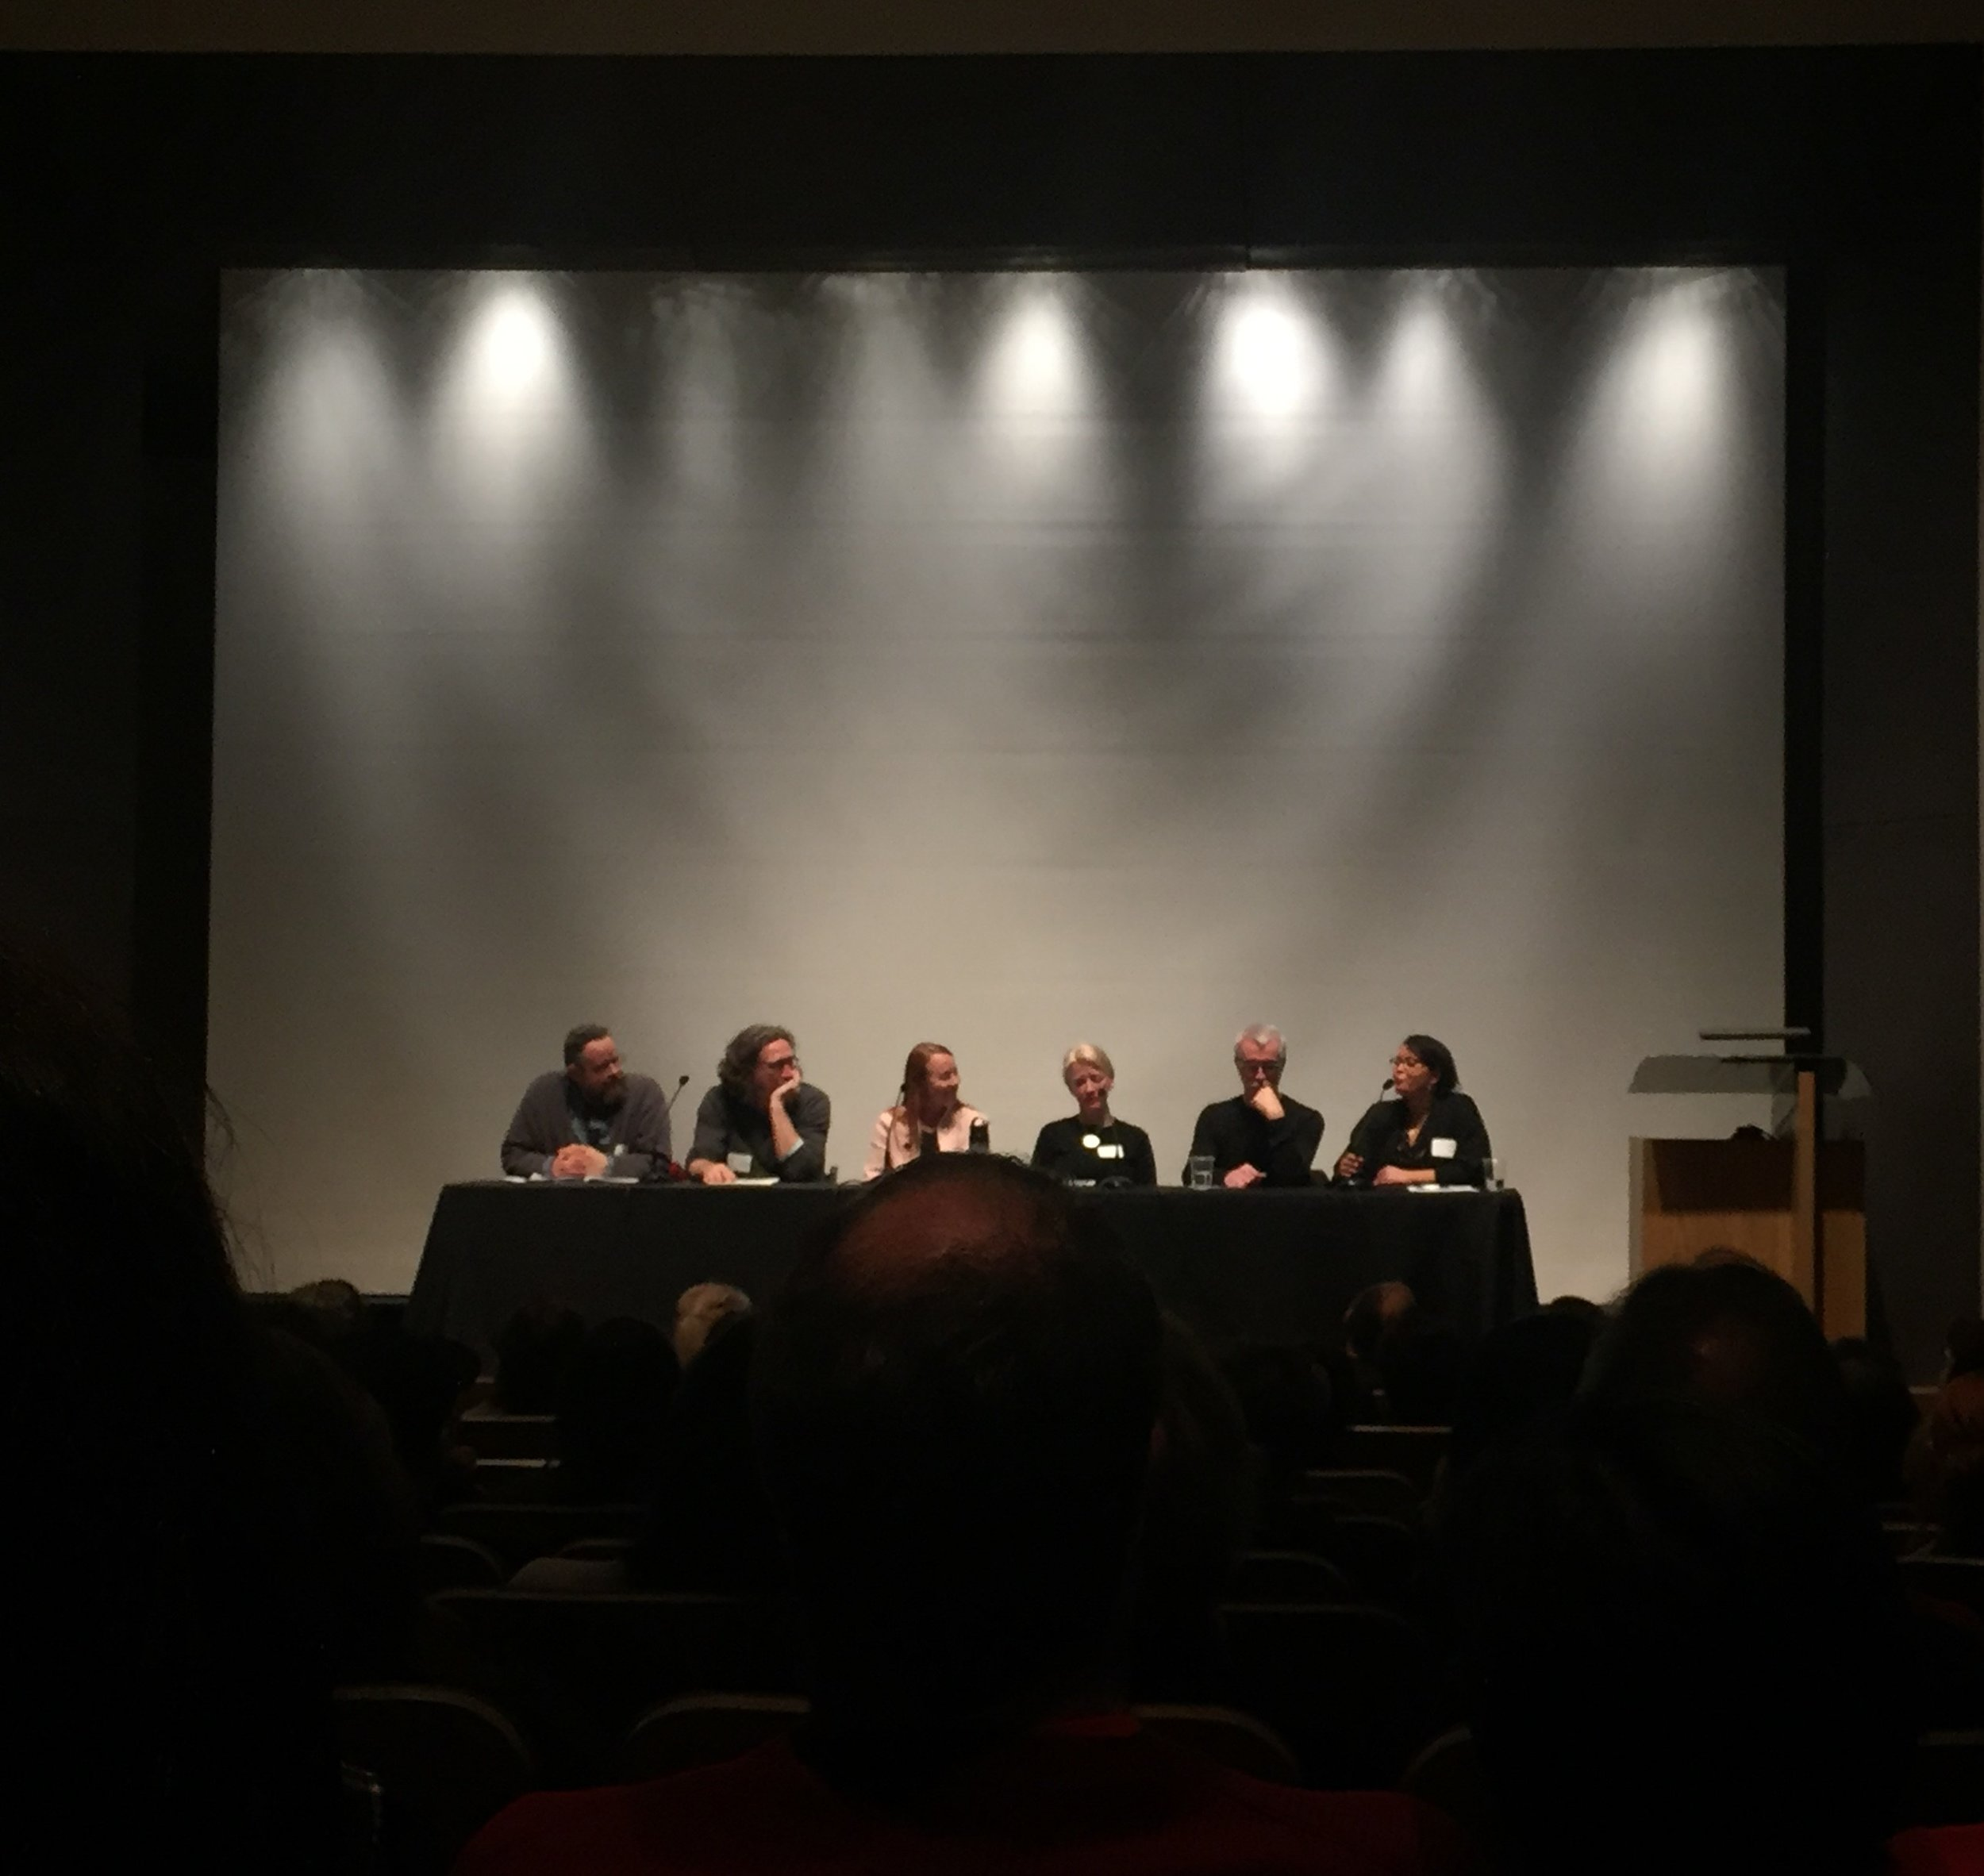 Panelists from Left to Right: Joey Veltkamp, Tim Detweiler, Asta Roseway, Christiane Pein, Greg Bell, Leilani Lewis